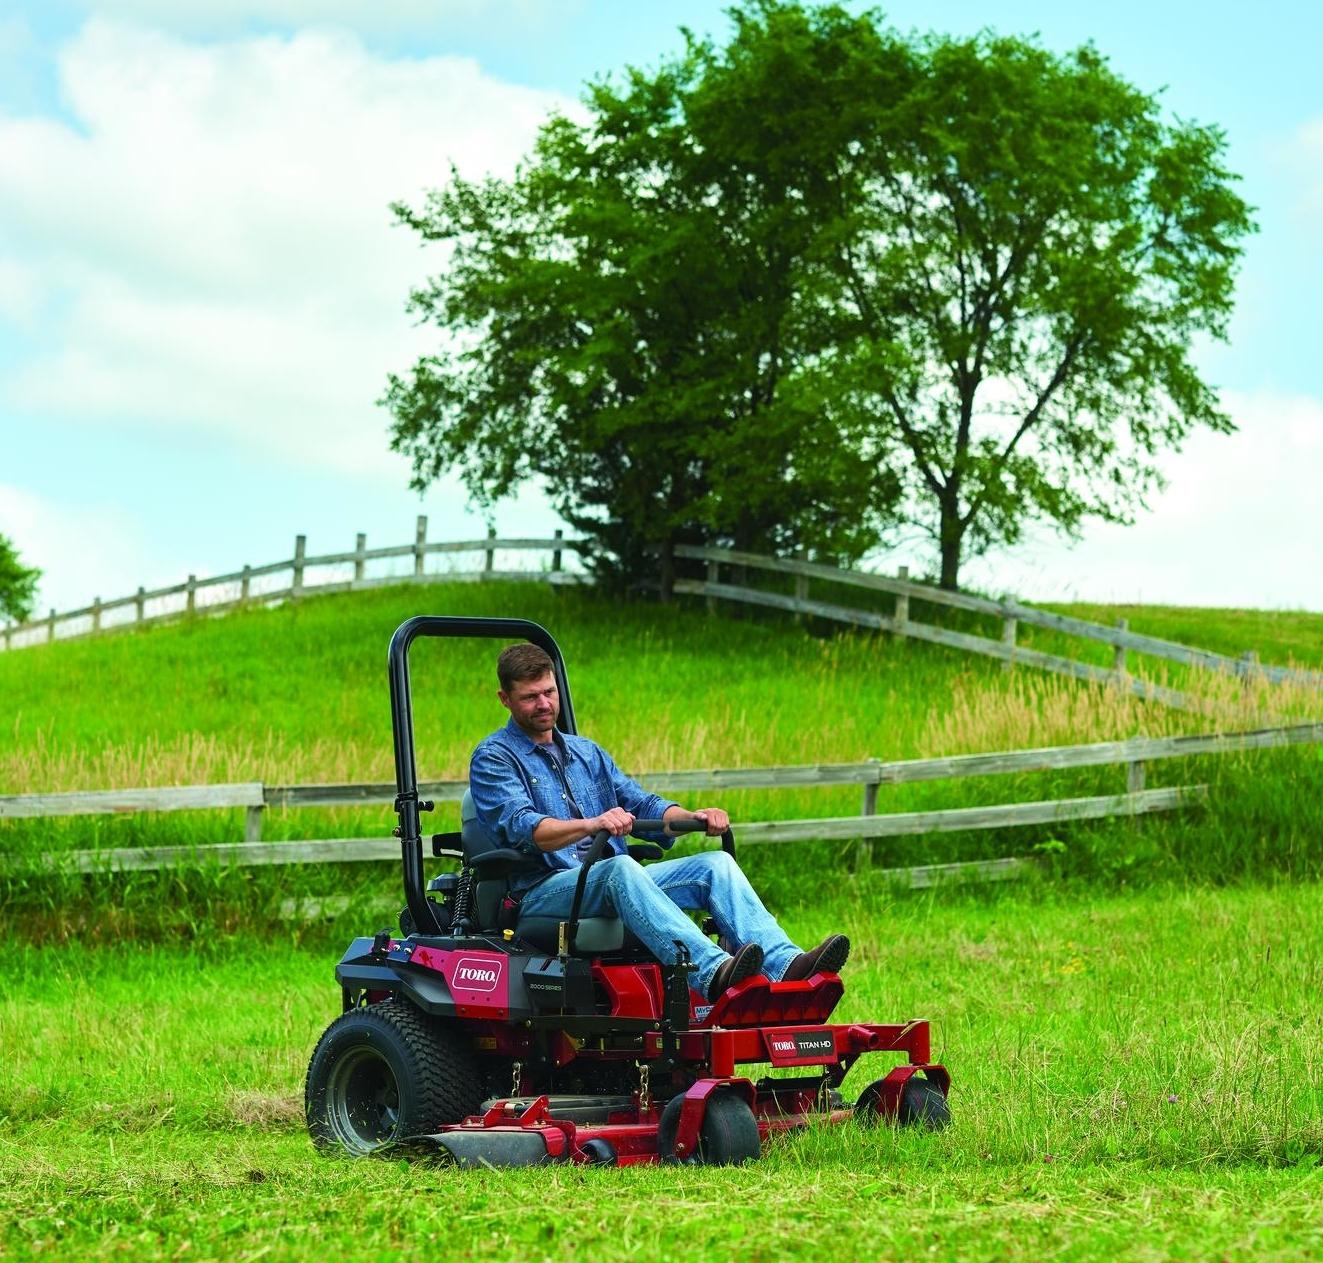 2019 Toro® Titan® zero turn mower cutting grass in gated field